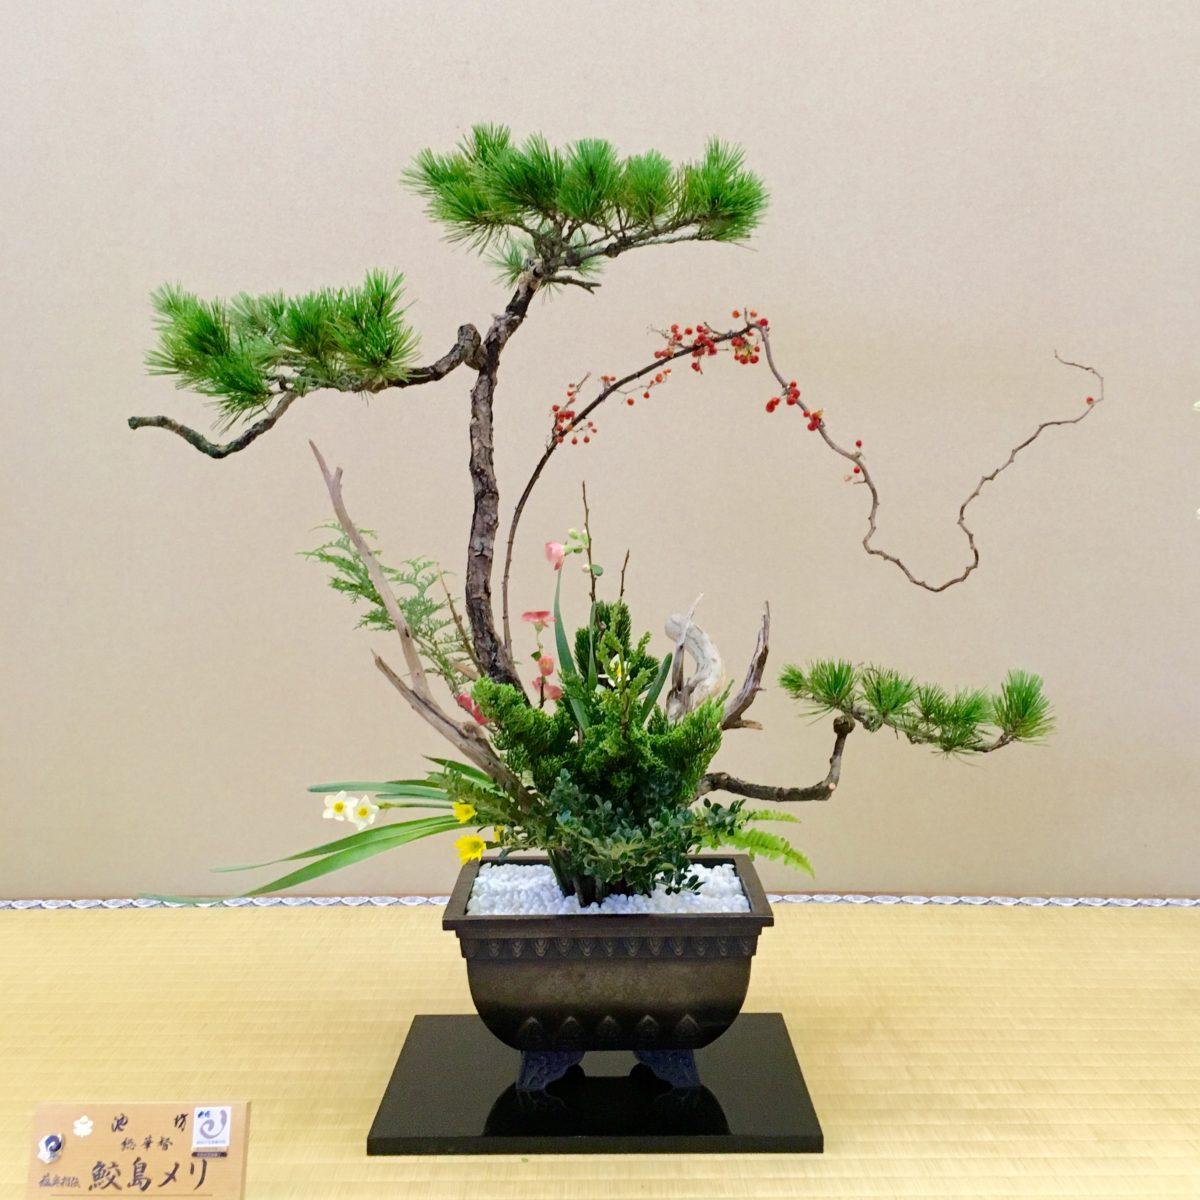 ikebana-composizione-floreale